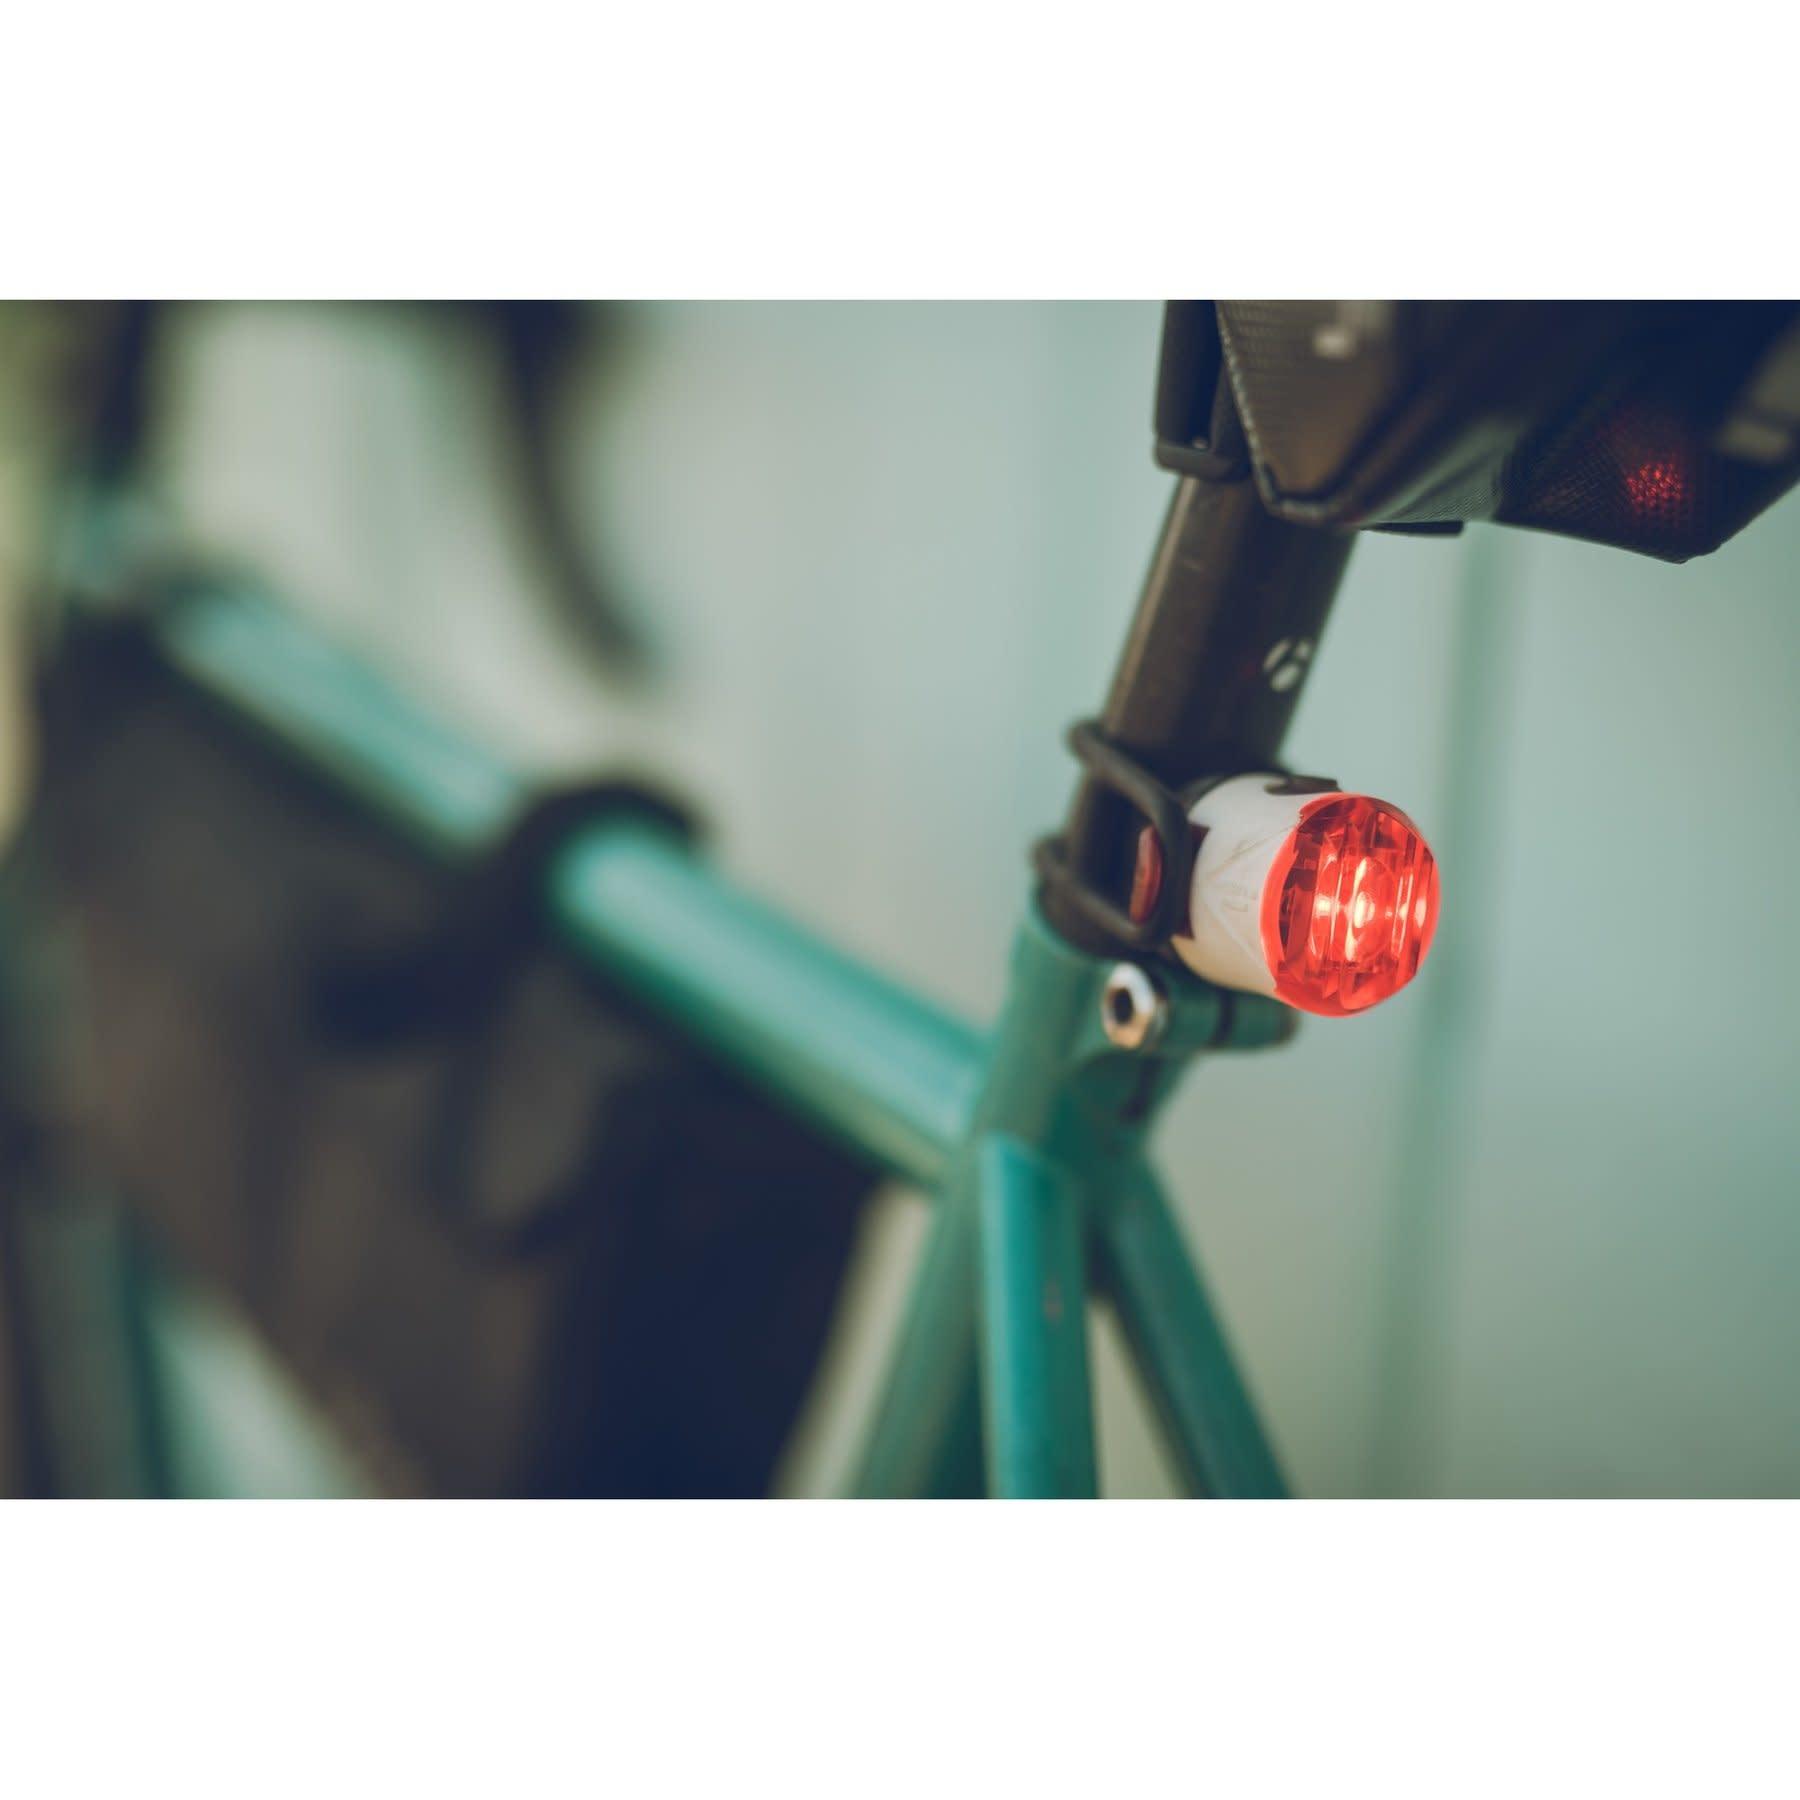 LEZYNE Lezyne Femto Drive Rear Bike Light